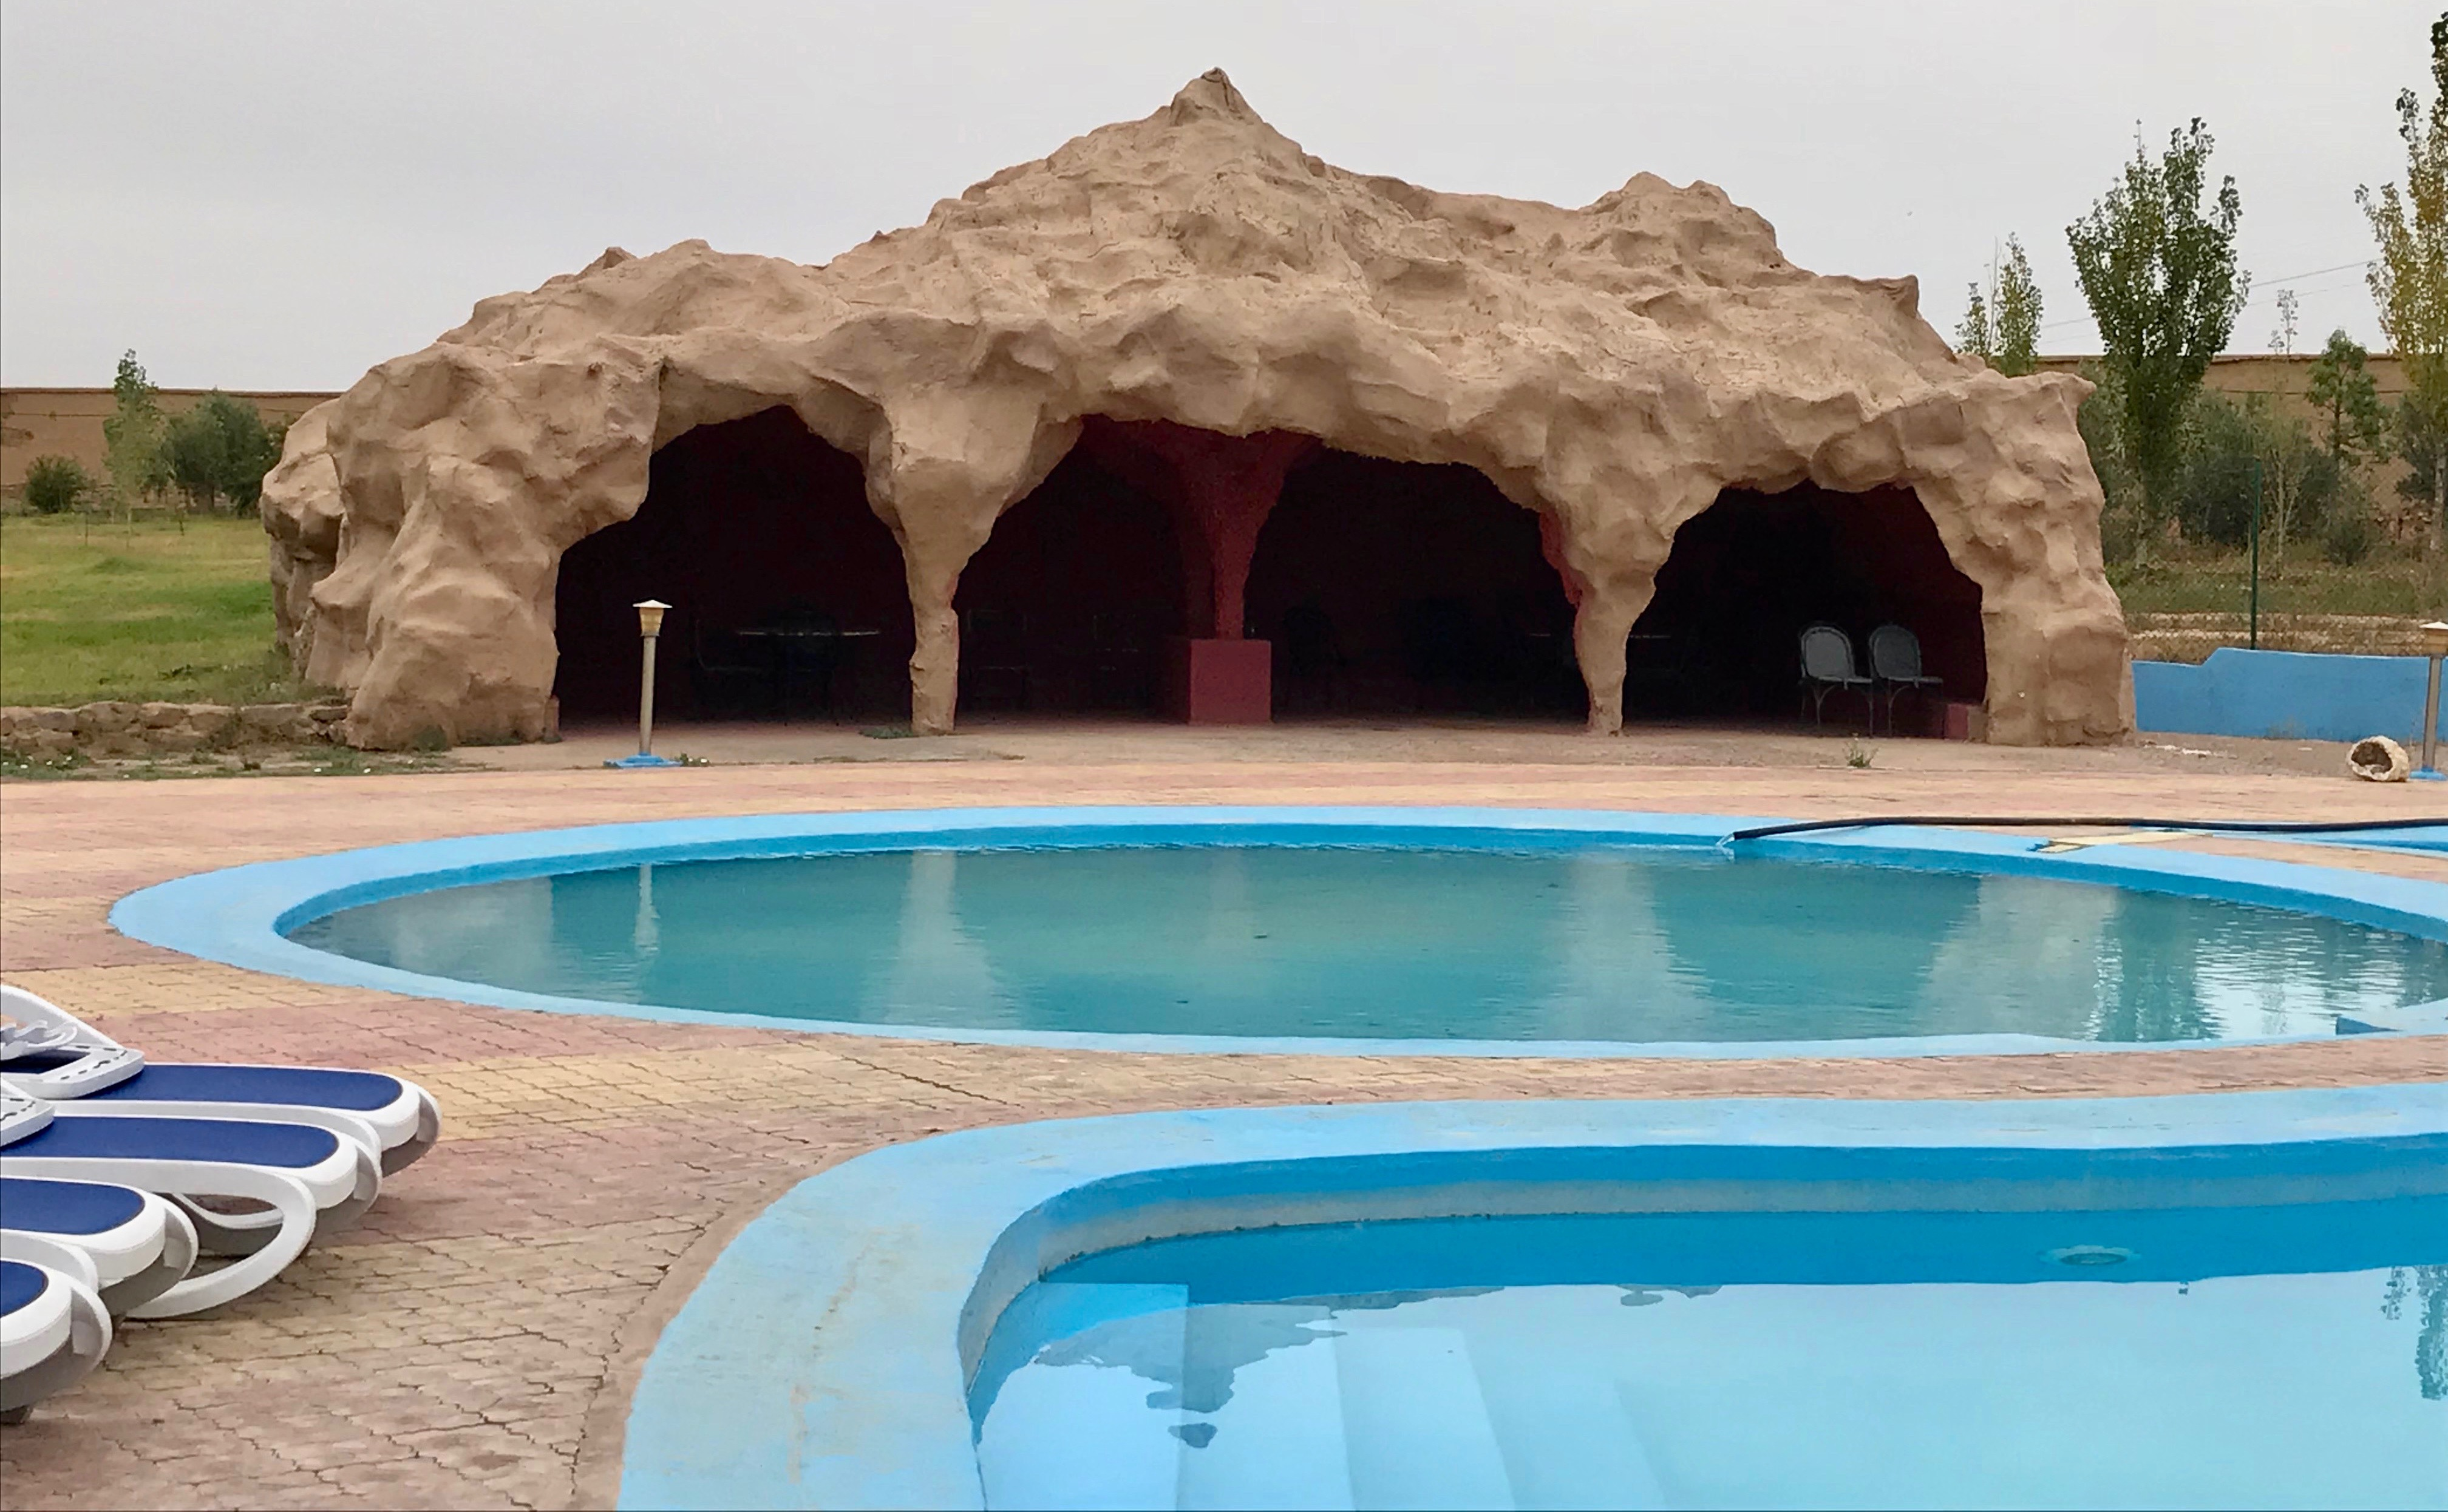 Pool at Hotel Taddart, Meknes-Tafilalet